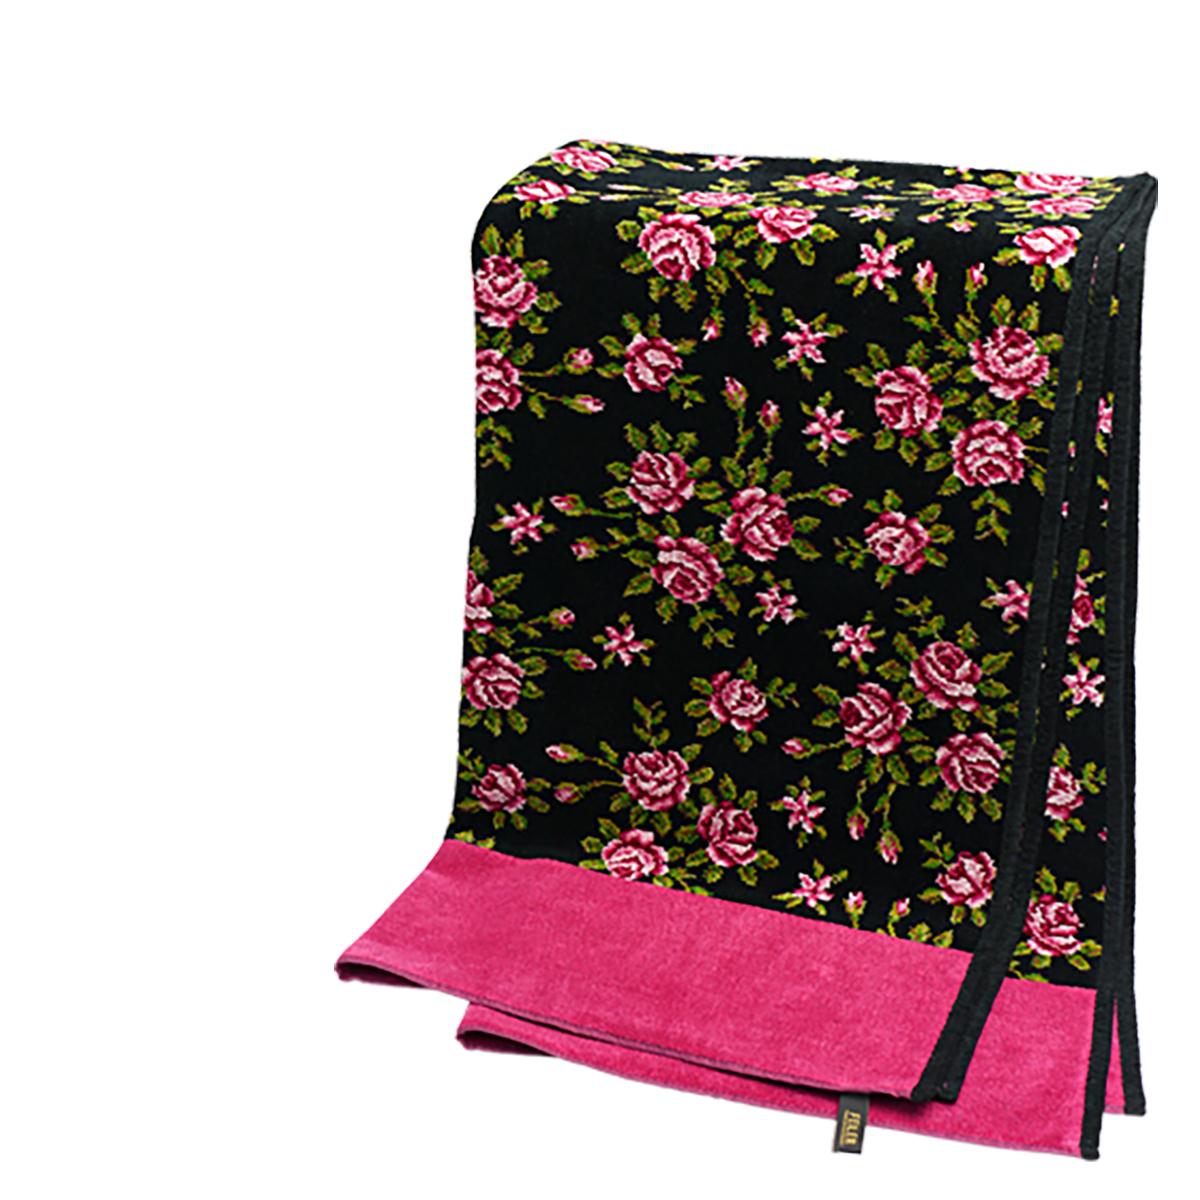 【Max1,000円OFFクーポン】フェイラー バスタオル ミリアム ブラックチェリー FEILER 75x150cm FEILER Chenille Bath Towel Miriam Black ギフト・のし可